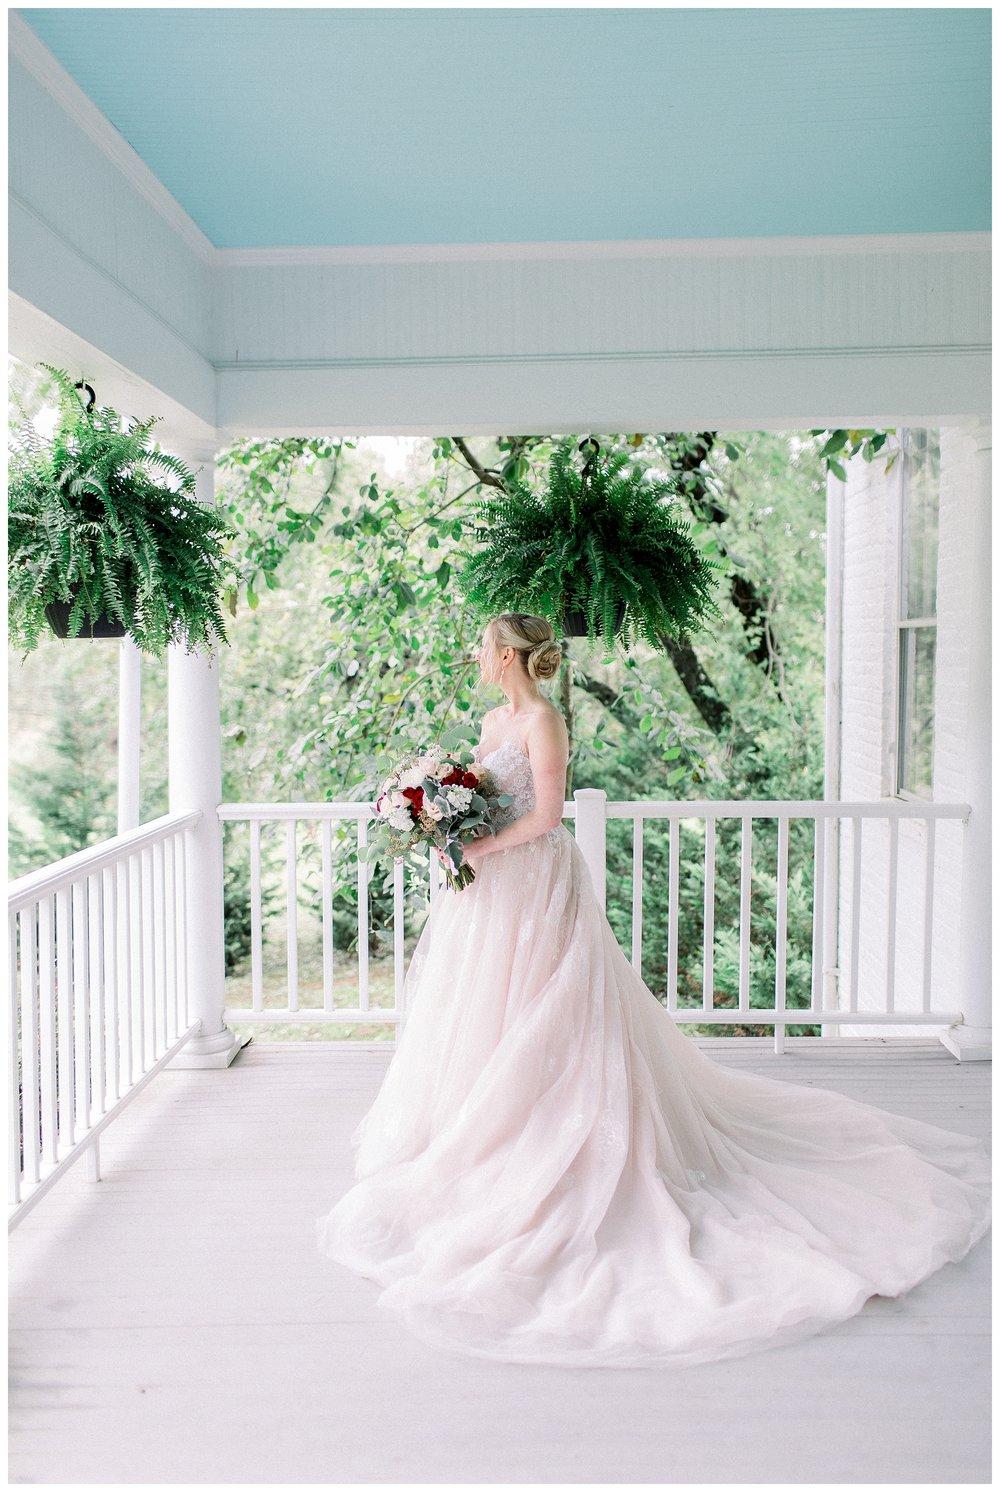 Whitehall Estate Wedding | Northern Virginia Wedding Photographer Kir Tuben_0036.jpg